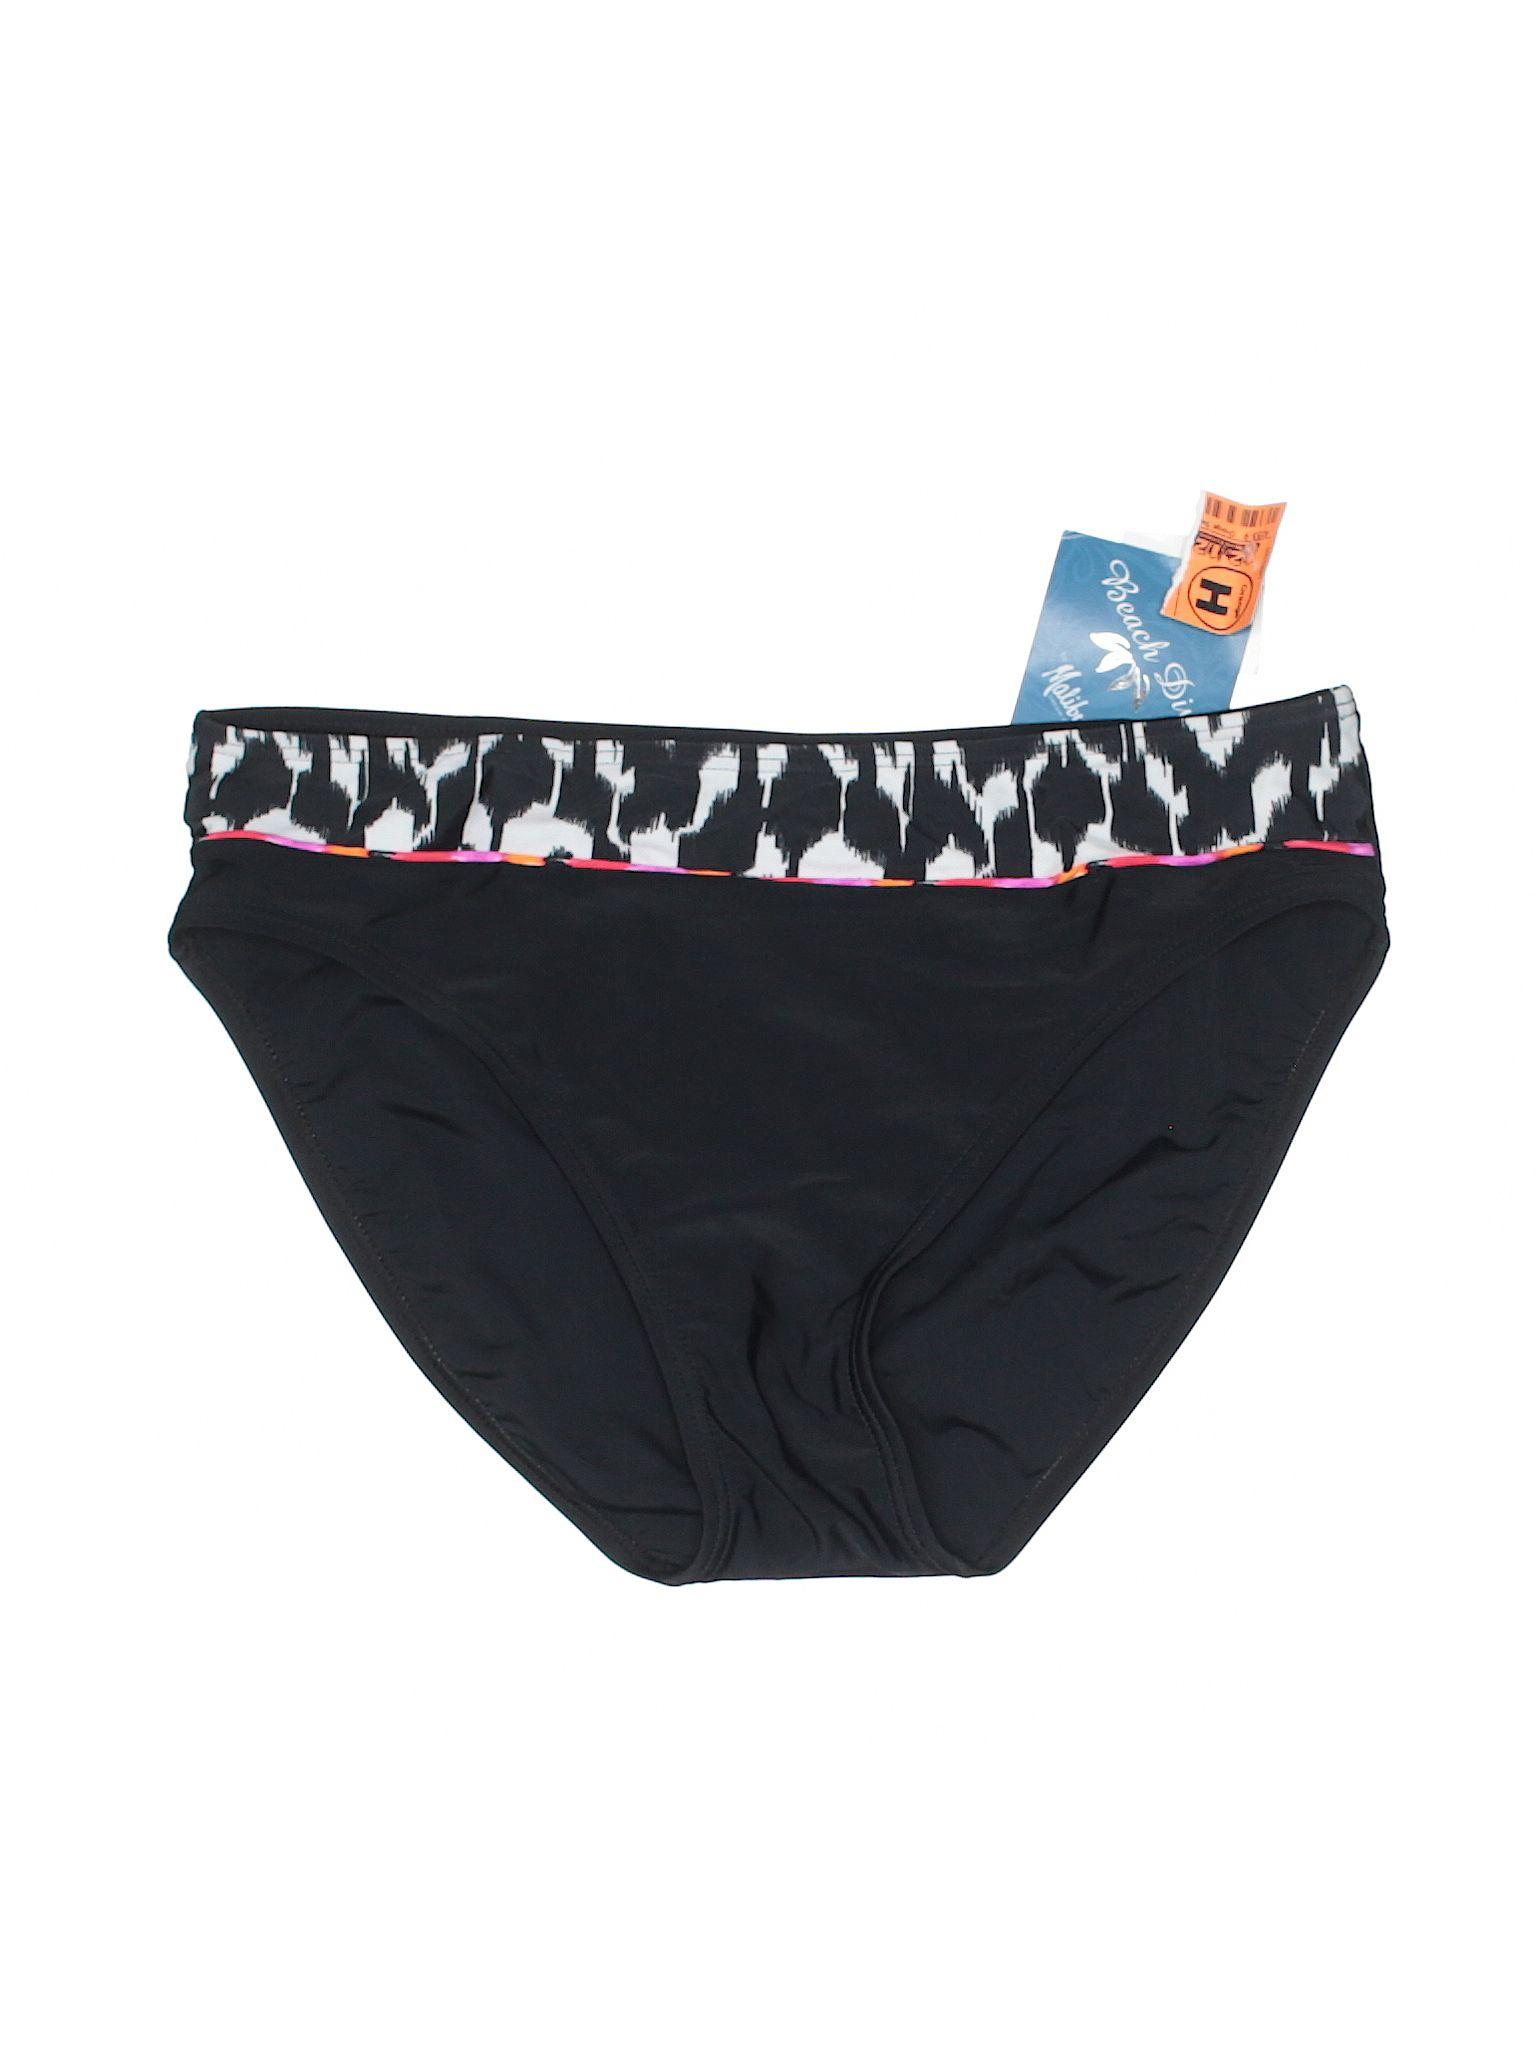 8fdbb0c402 Beach Diva Swimsuit Bottoms: Size 14.00 Black Women's Swimwear - New With  Tags - $8.99